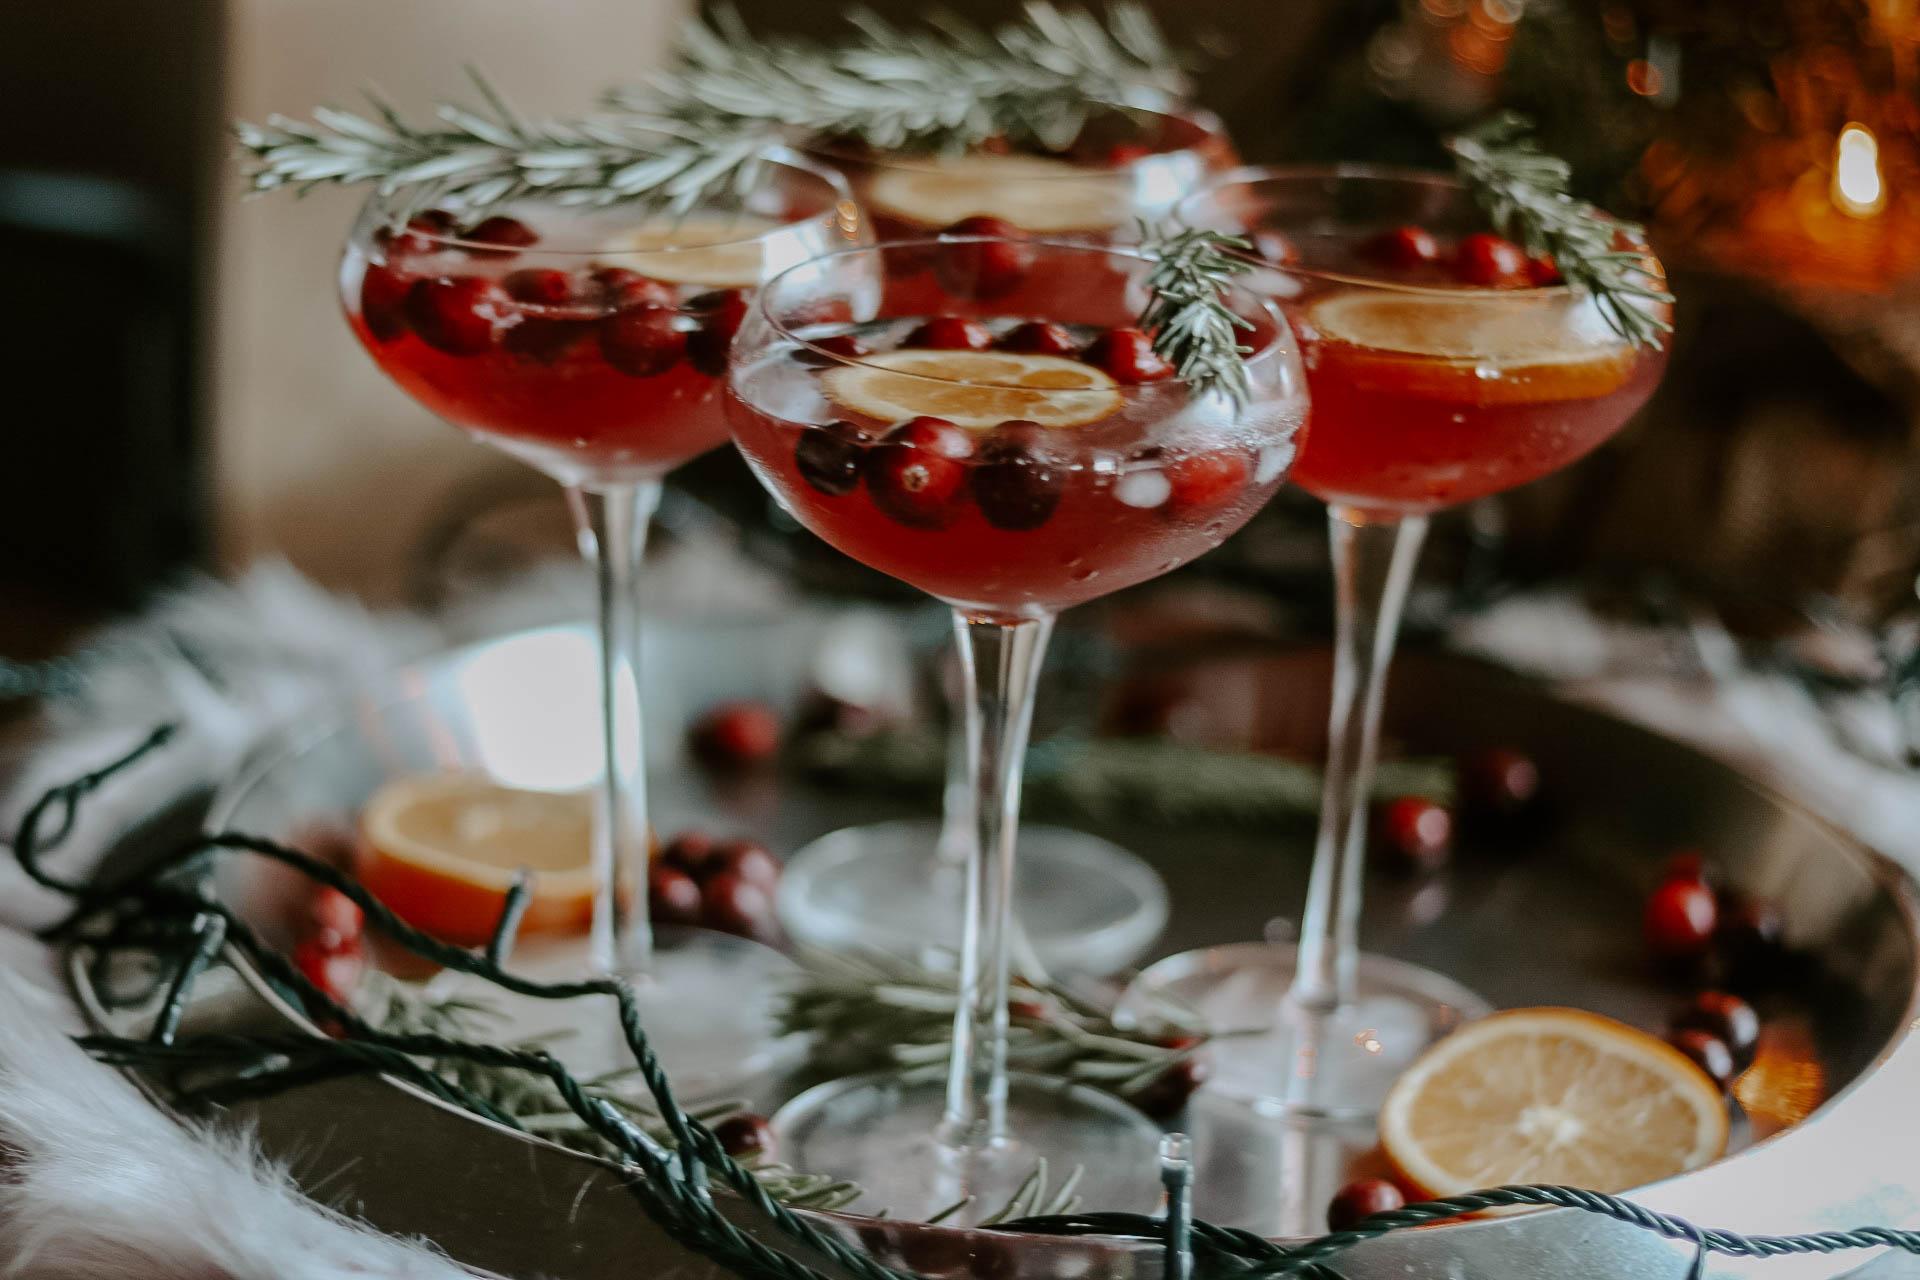 Champagne coupe glasses